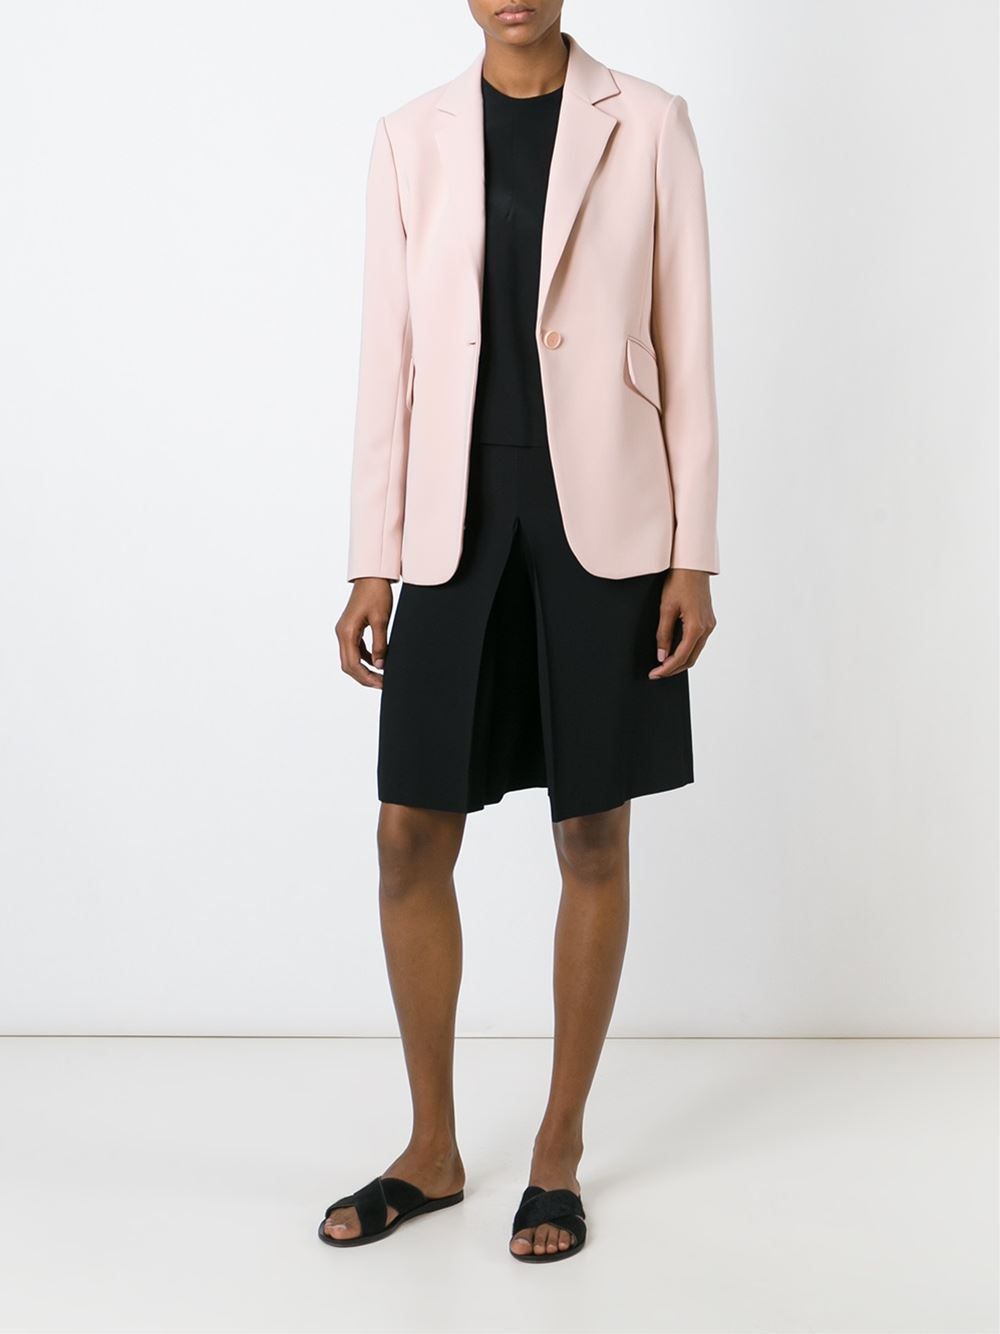 #theory #blazer #jacket #pink #nude #women #spring #style www.jofre.eu